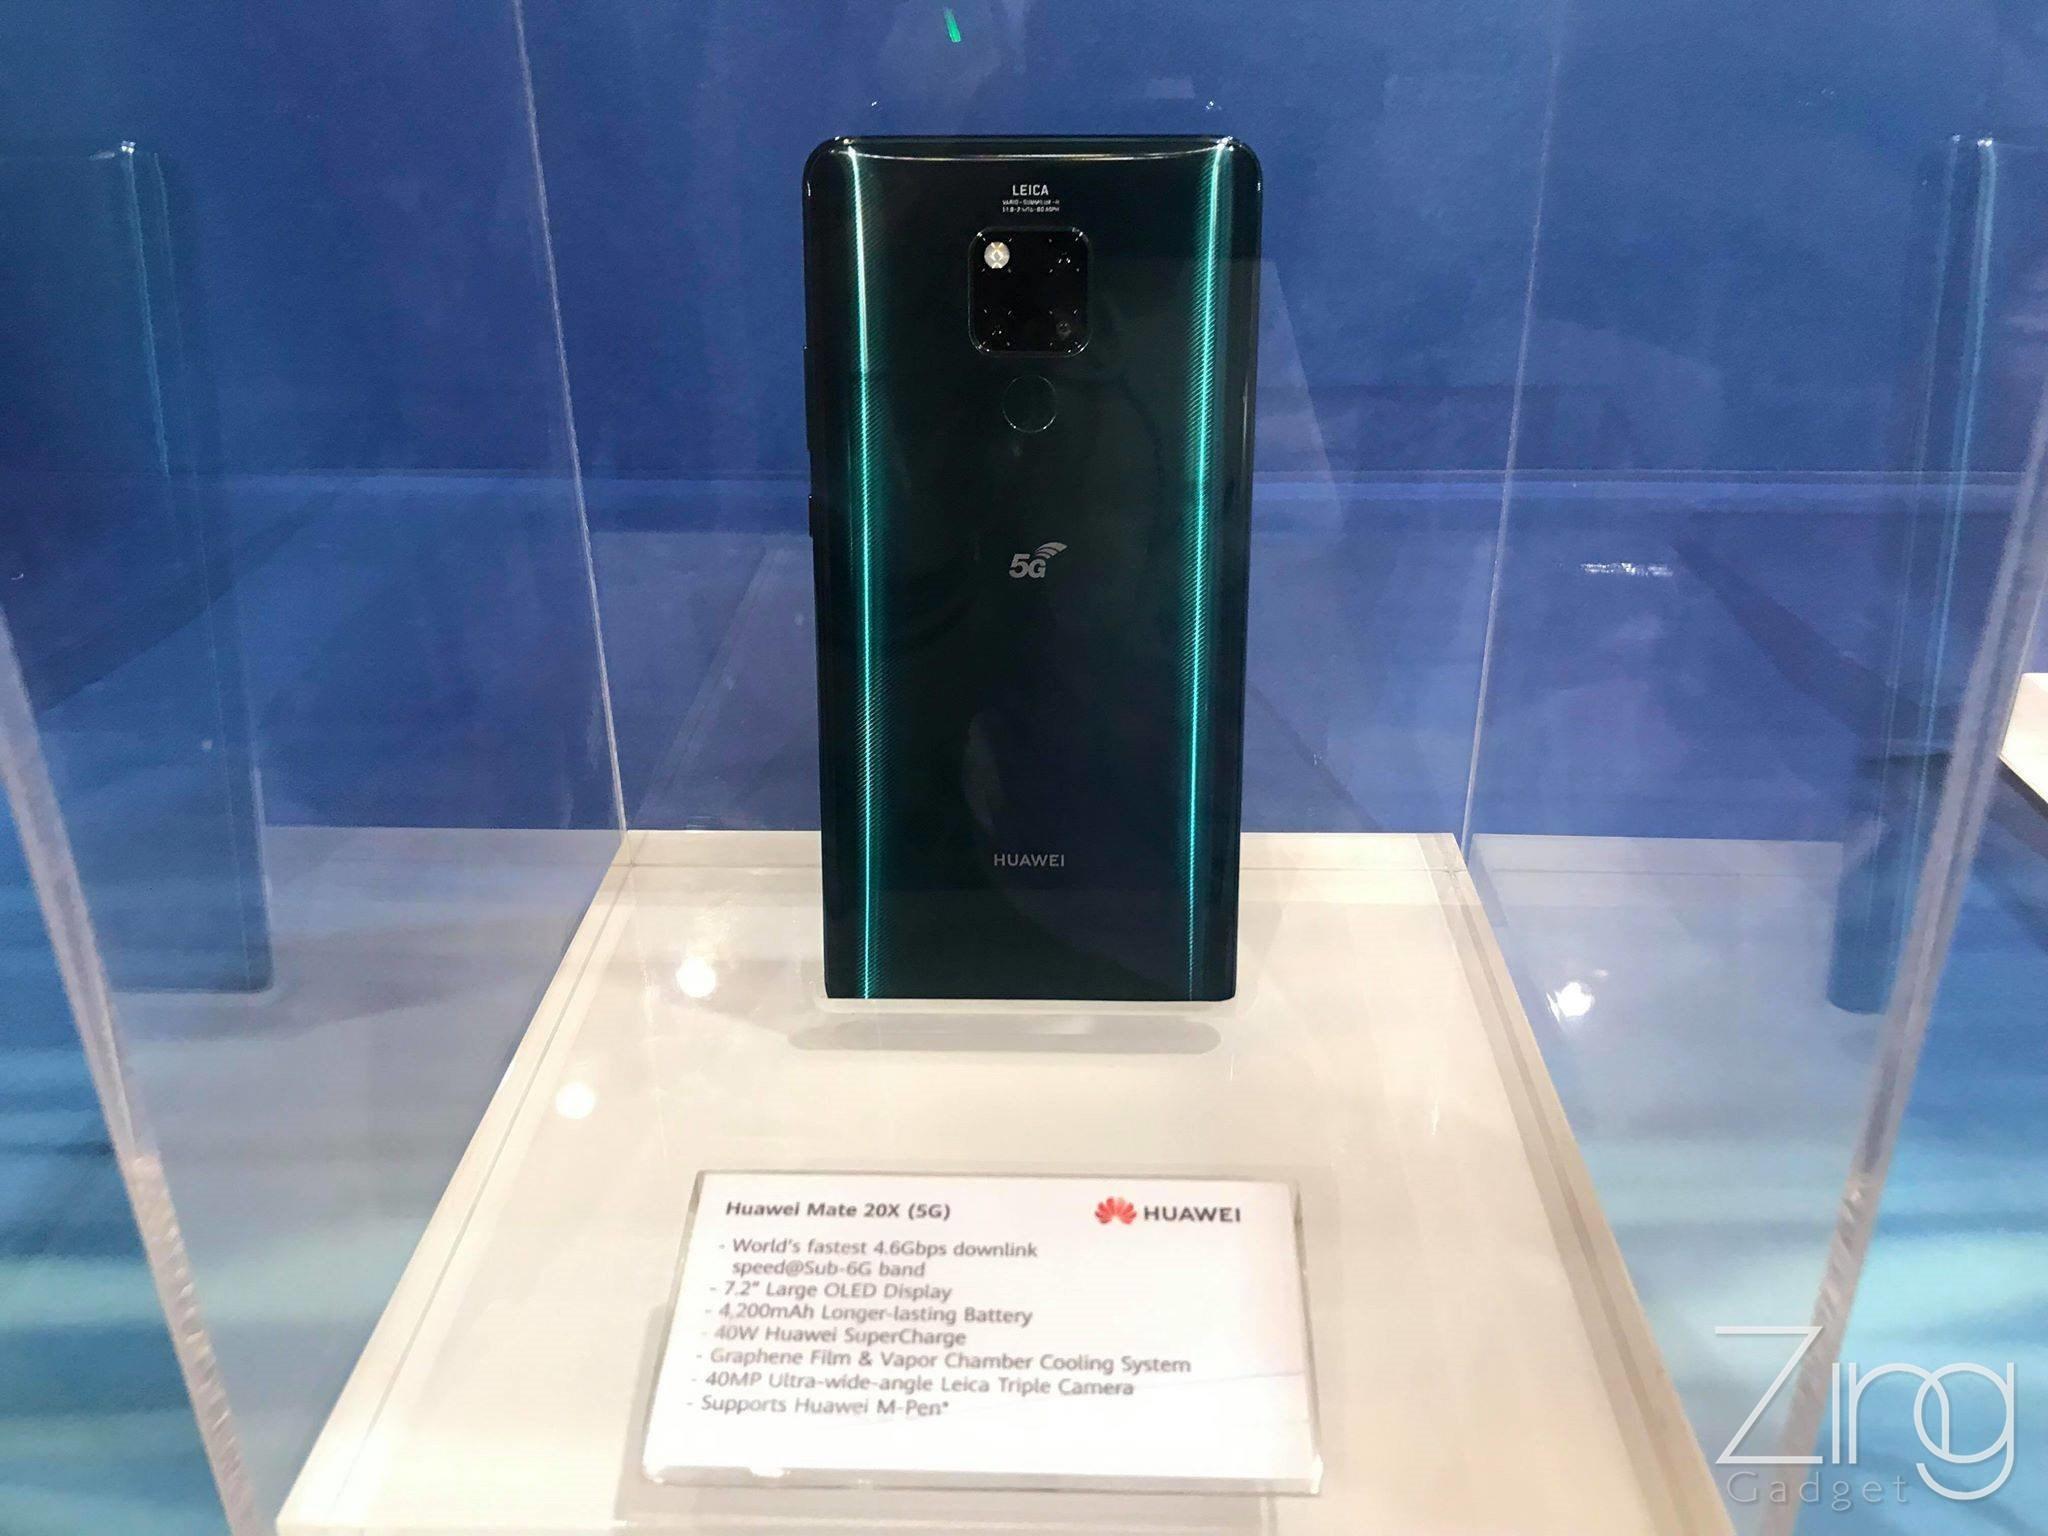 Ilyen élőben a Huawei Mate 20 X 5G okostelefon